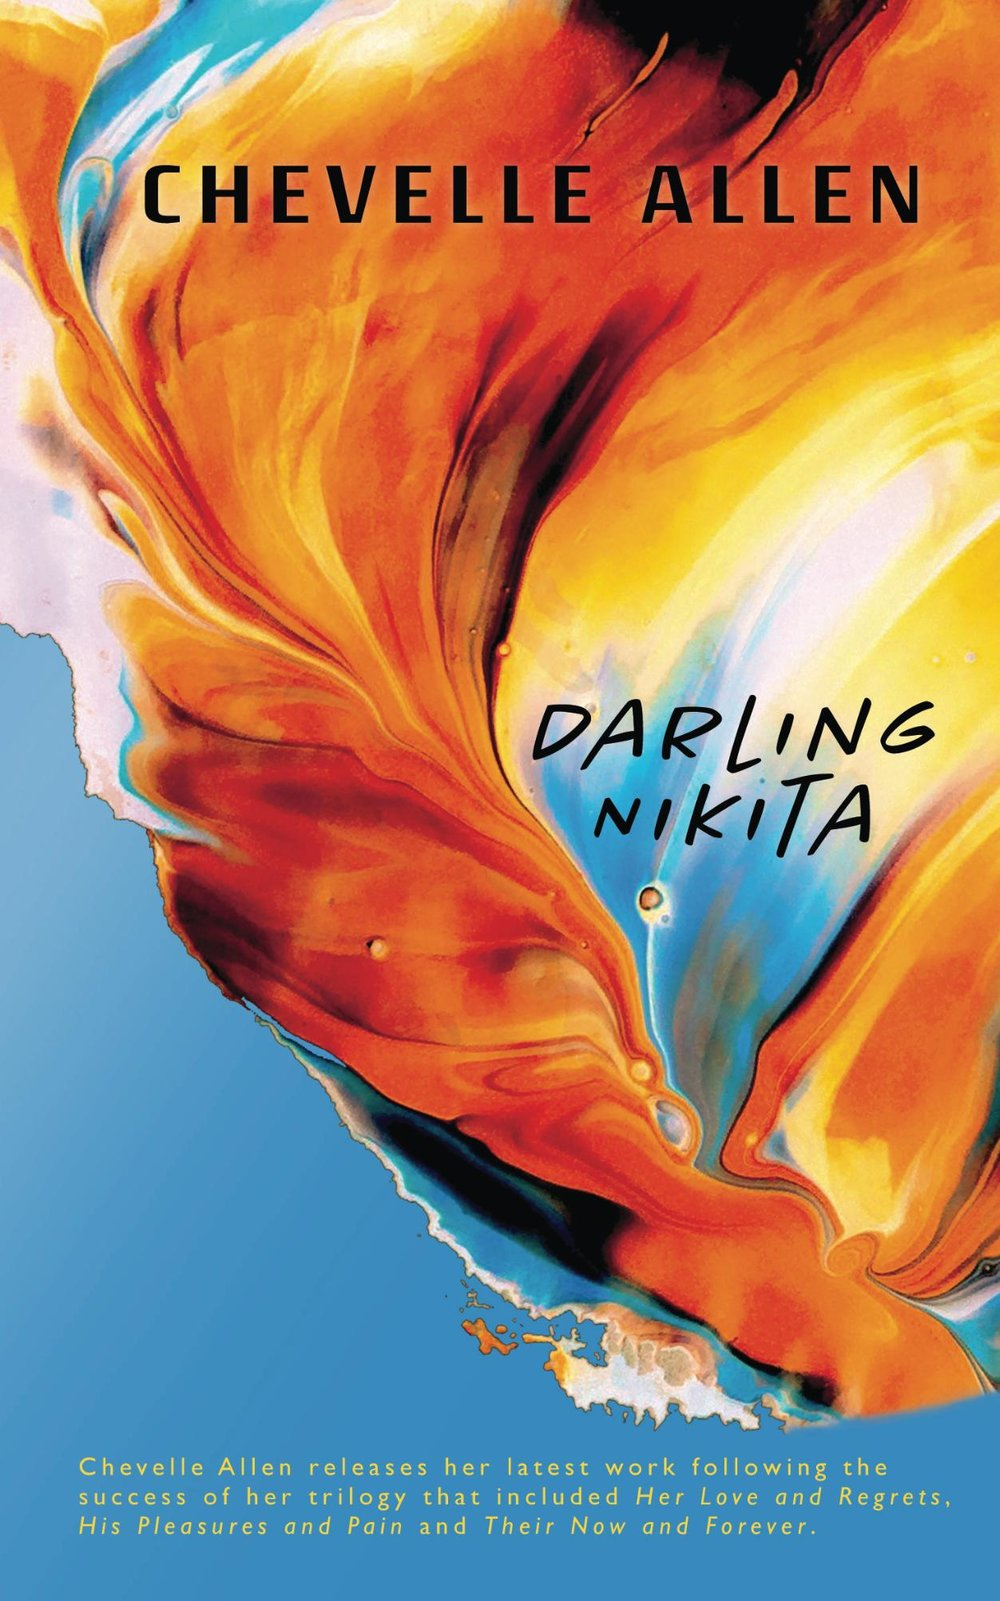 Darling_Nikita_Cover_for_Kindle (1).jpg